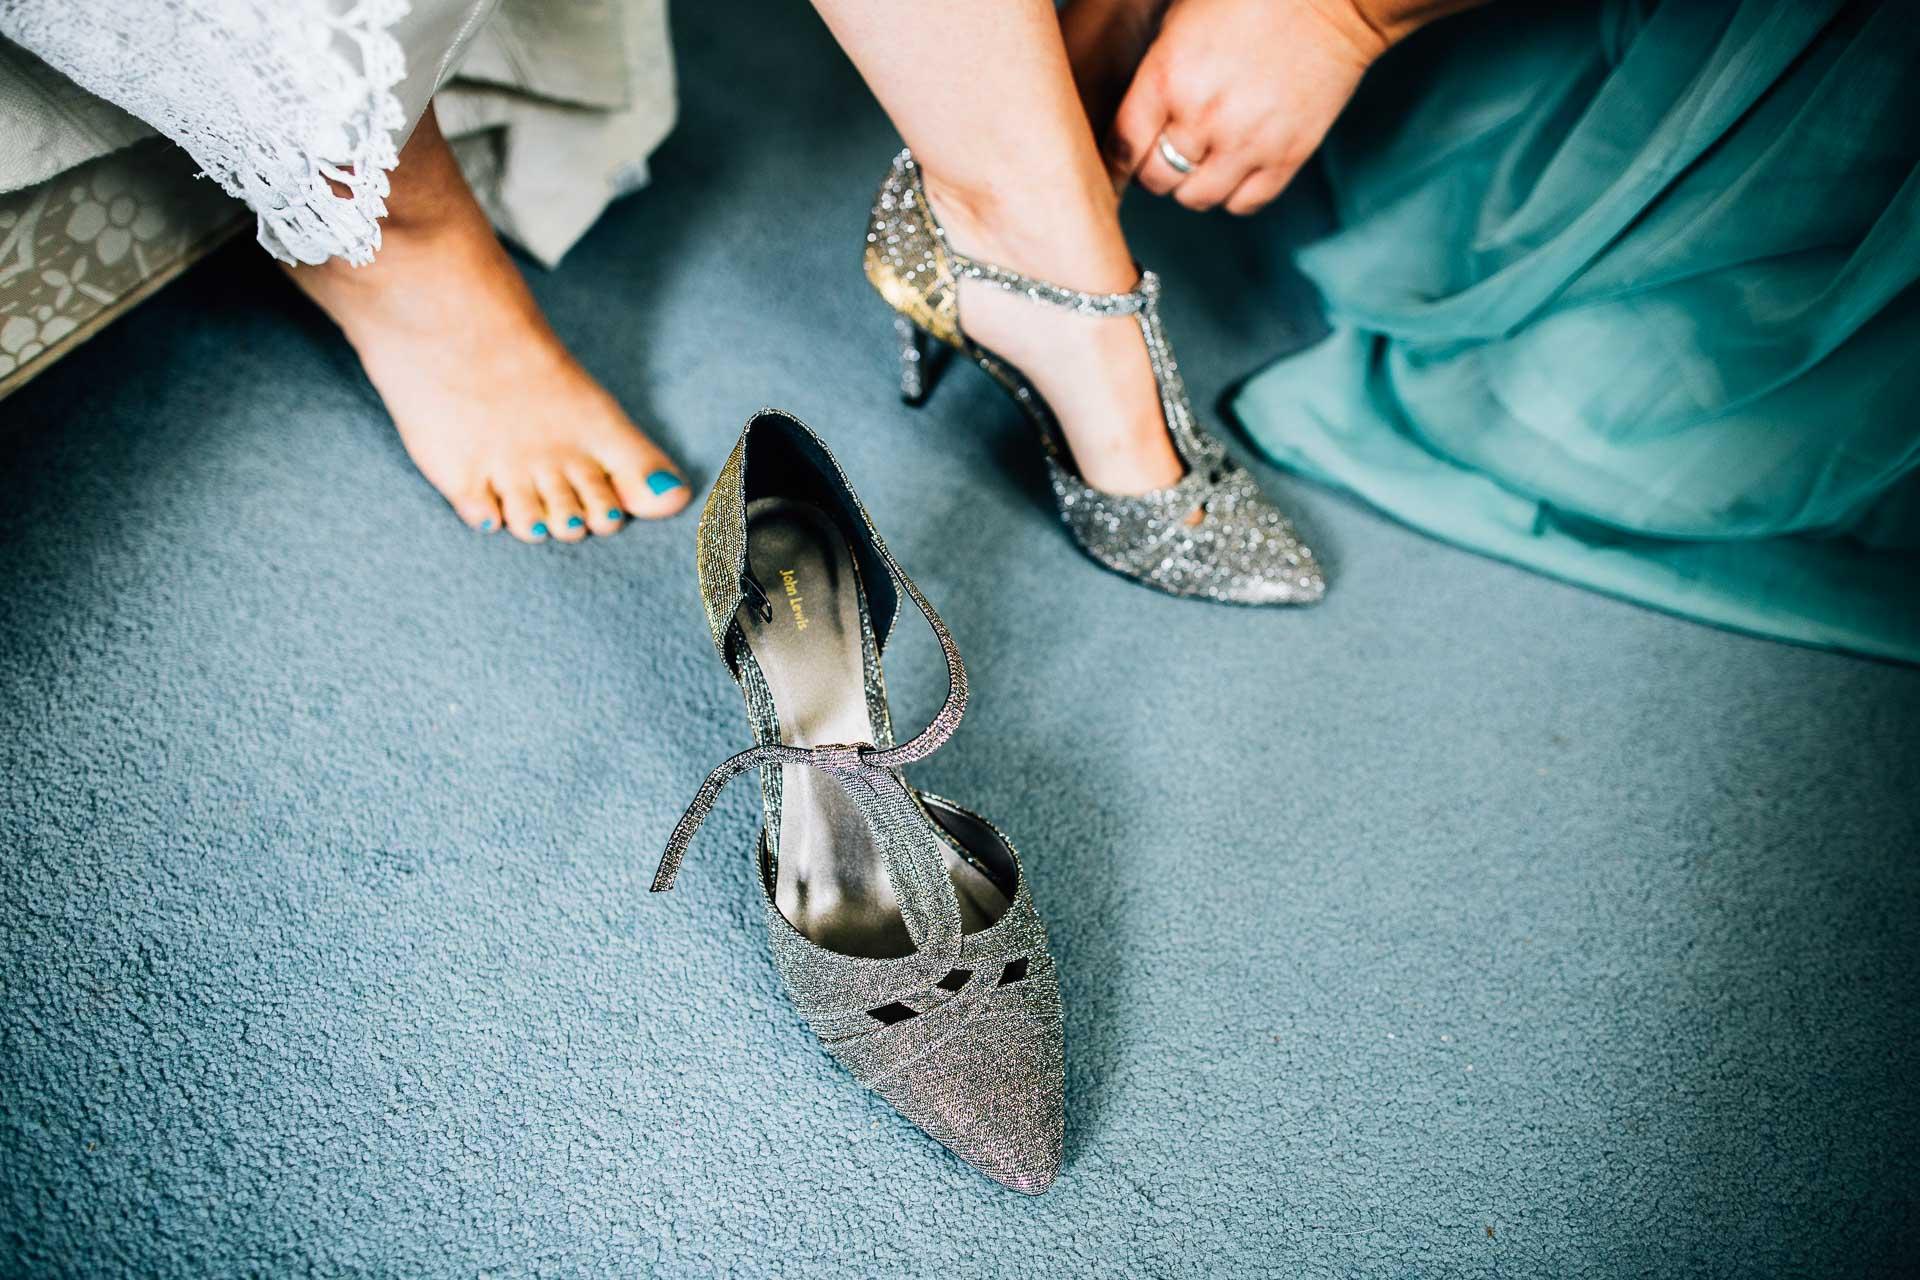 winterbourne-medieval-barn-wedding-photography-emma-andrew-42